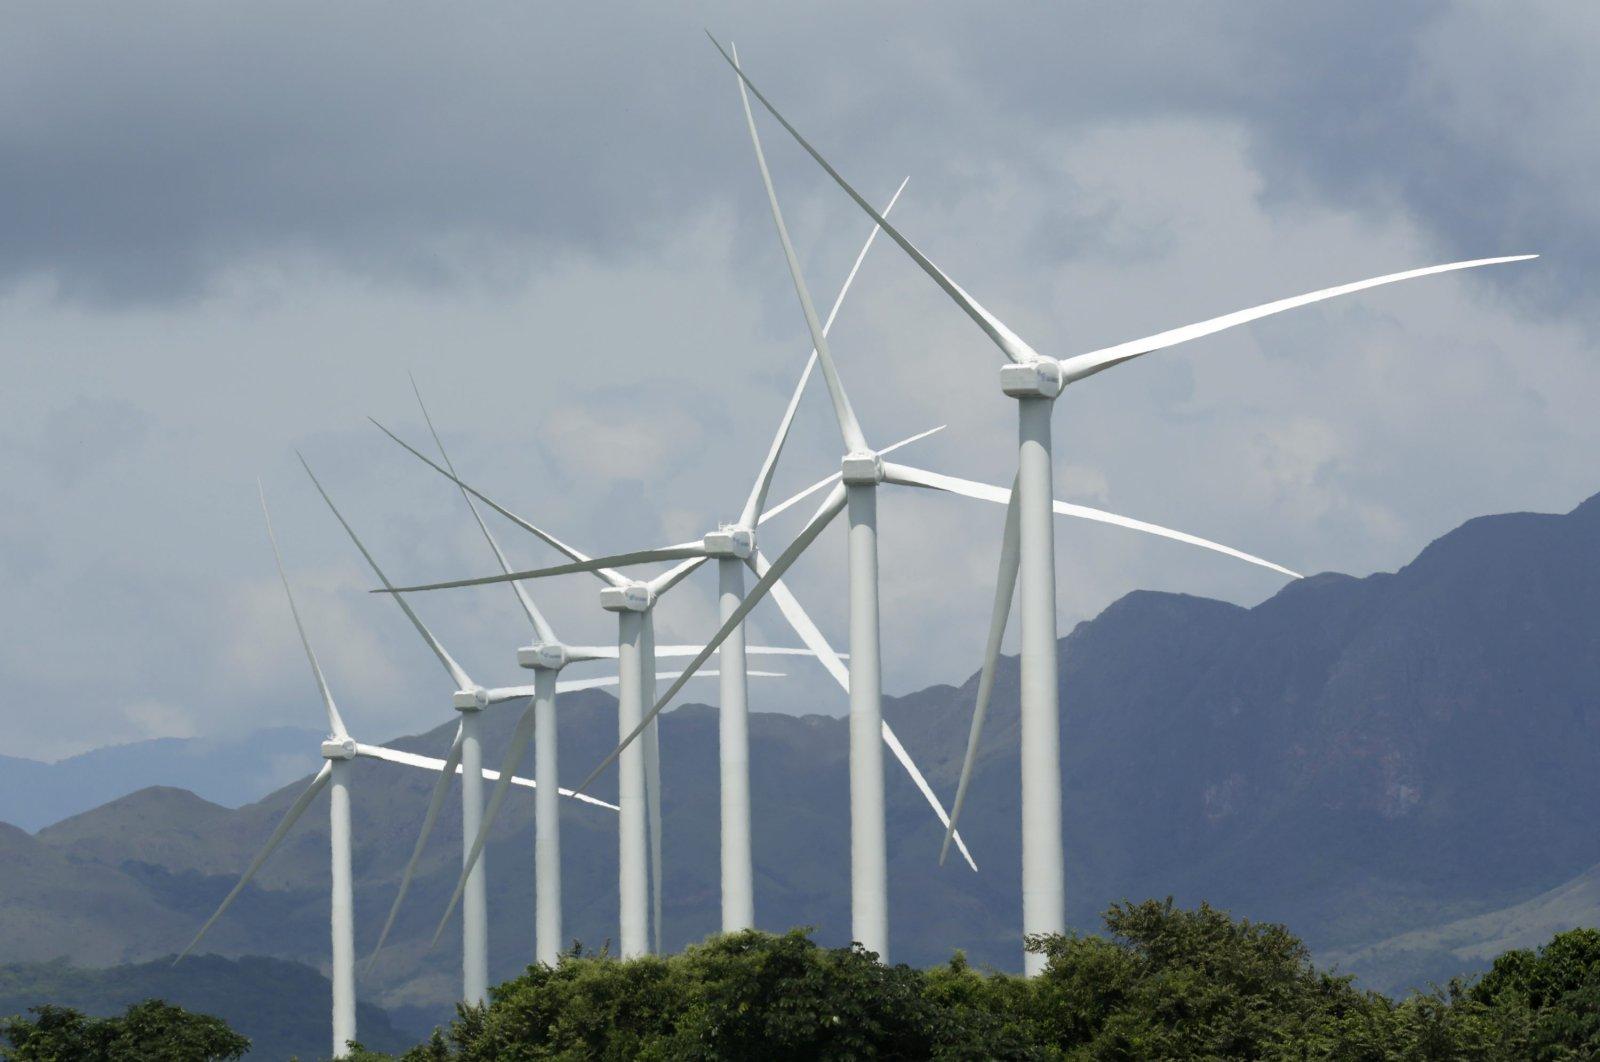 Wind turbines in Penonome, Panama, Tuesday, Nov. 10, 2015. (AP Photo)